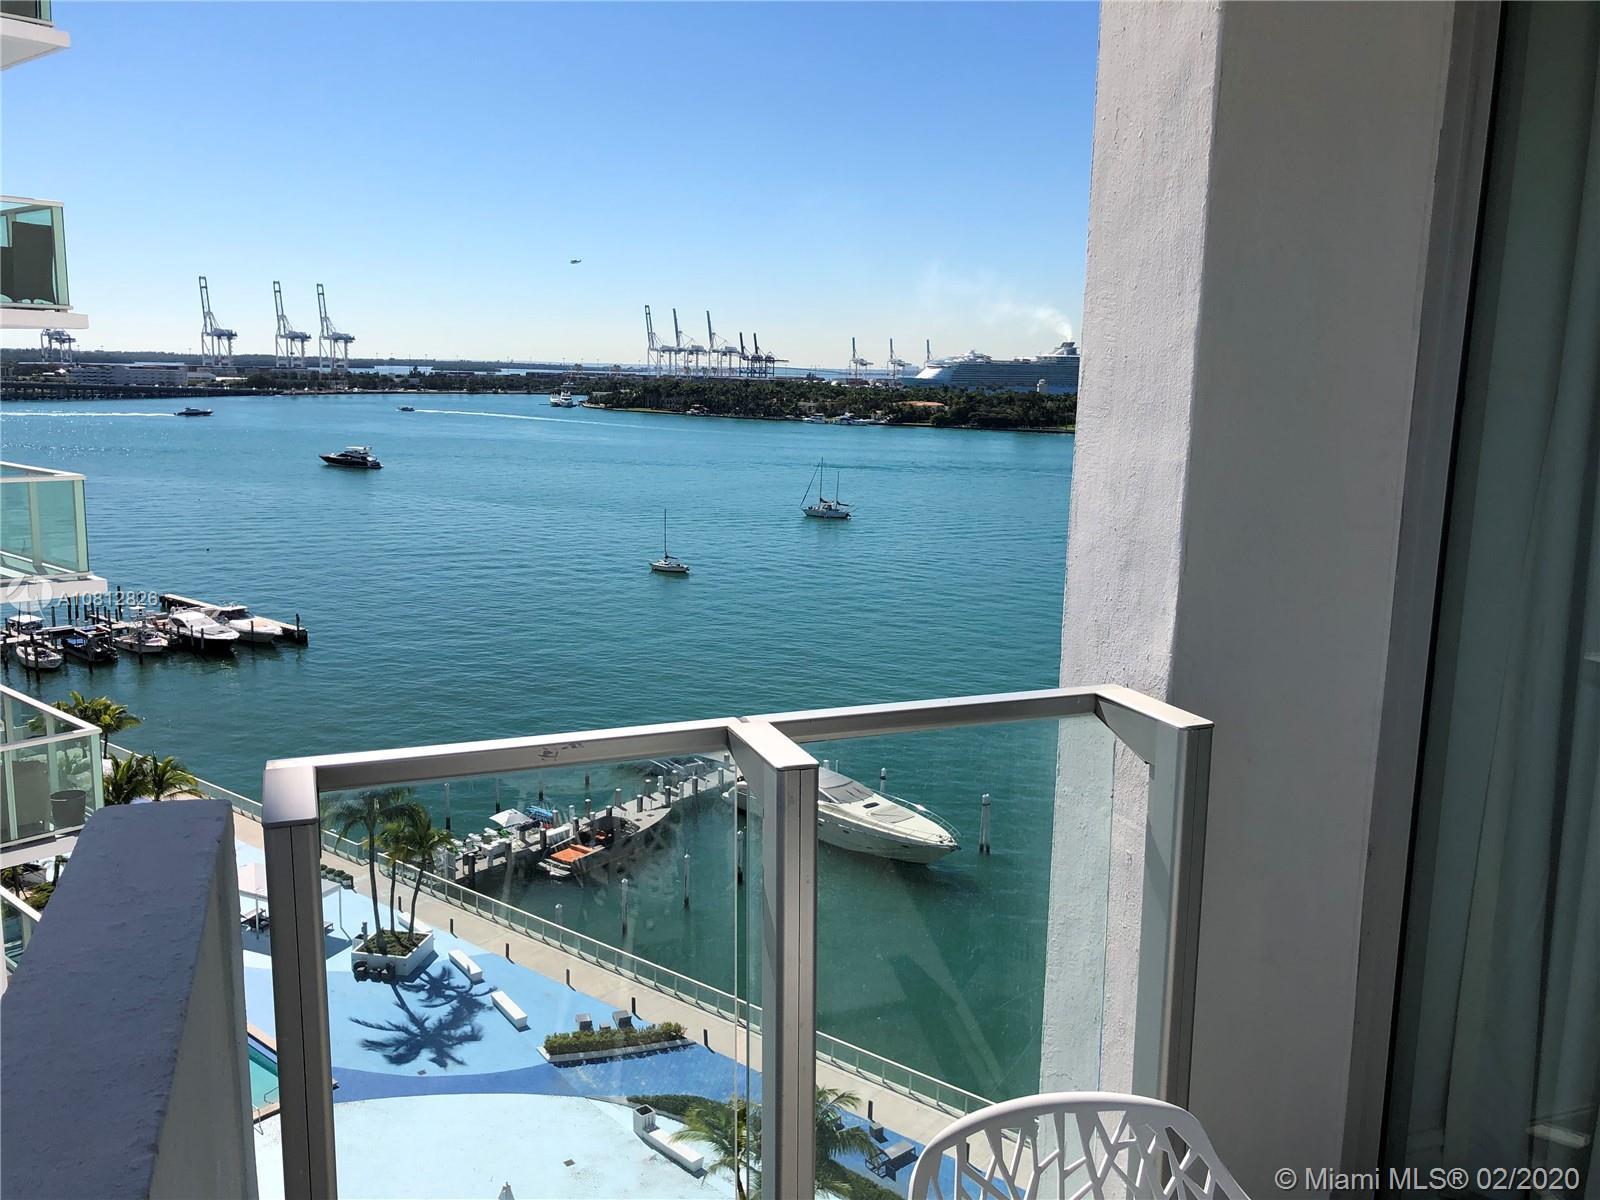 1100 West Ave #1127, Miami Beach, FL 33139 - Miami Beach, FL real estate listing